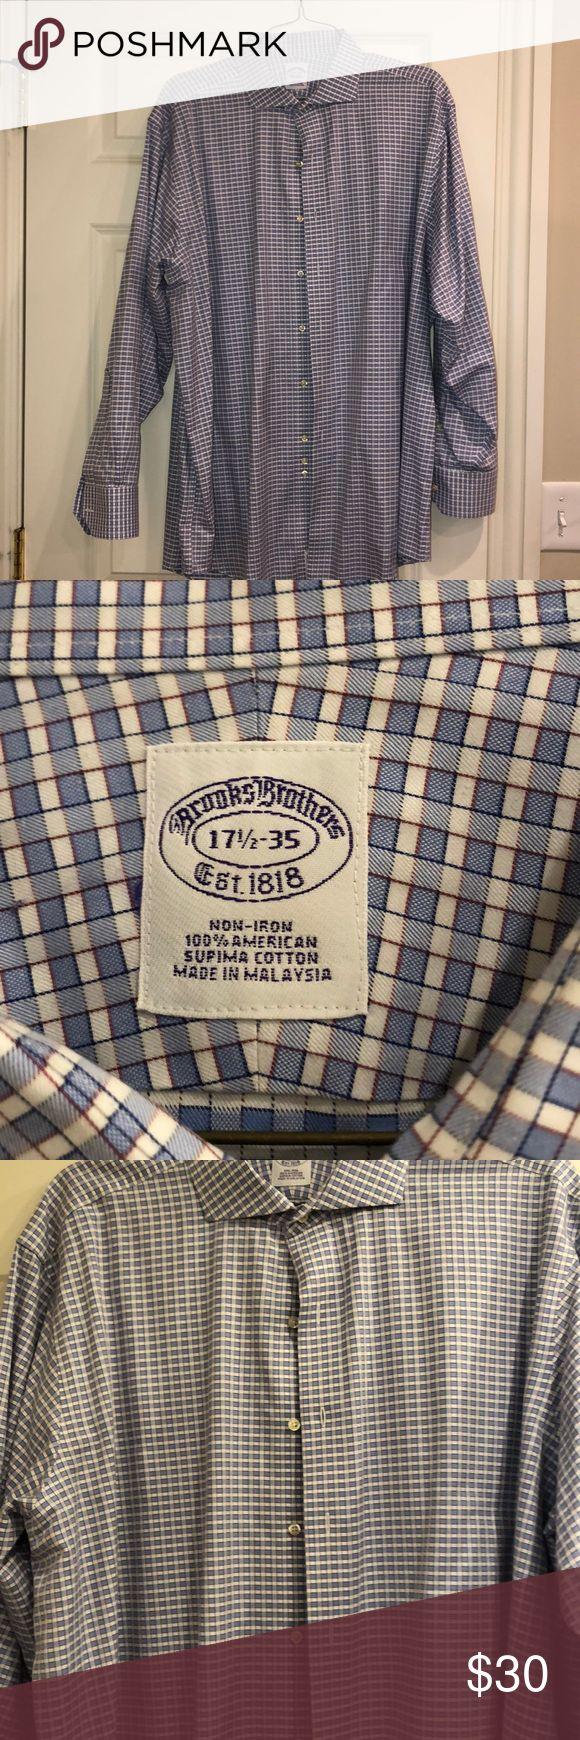 Brooks brothers dress shirt Brooks brothers dress shirt 17